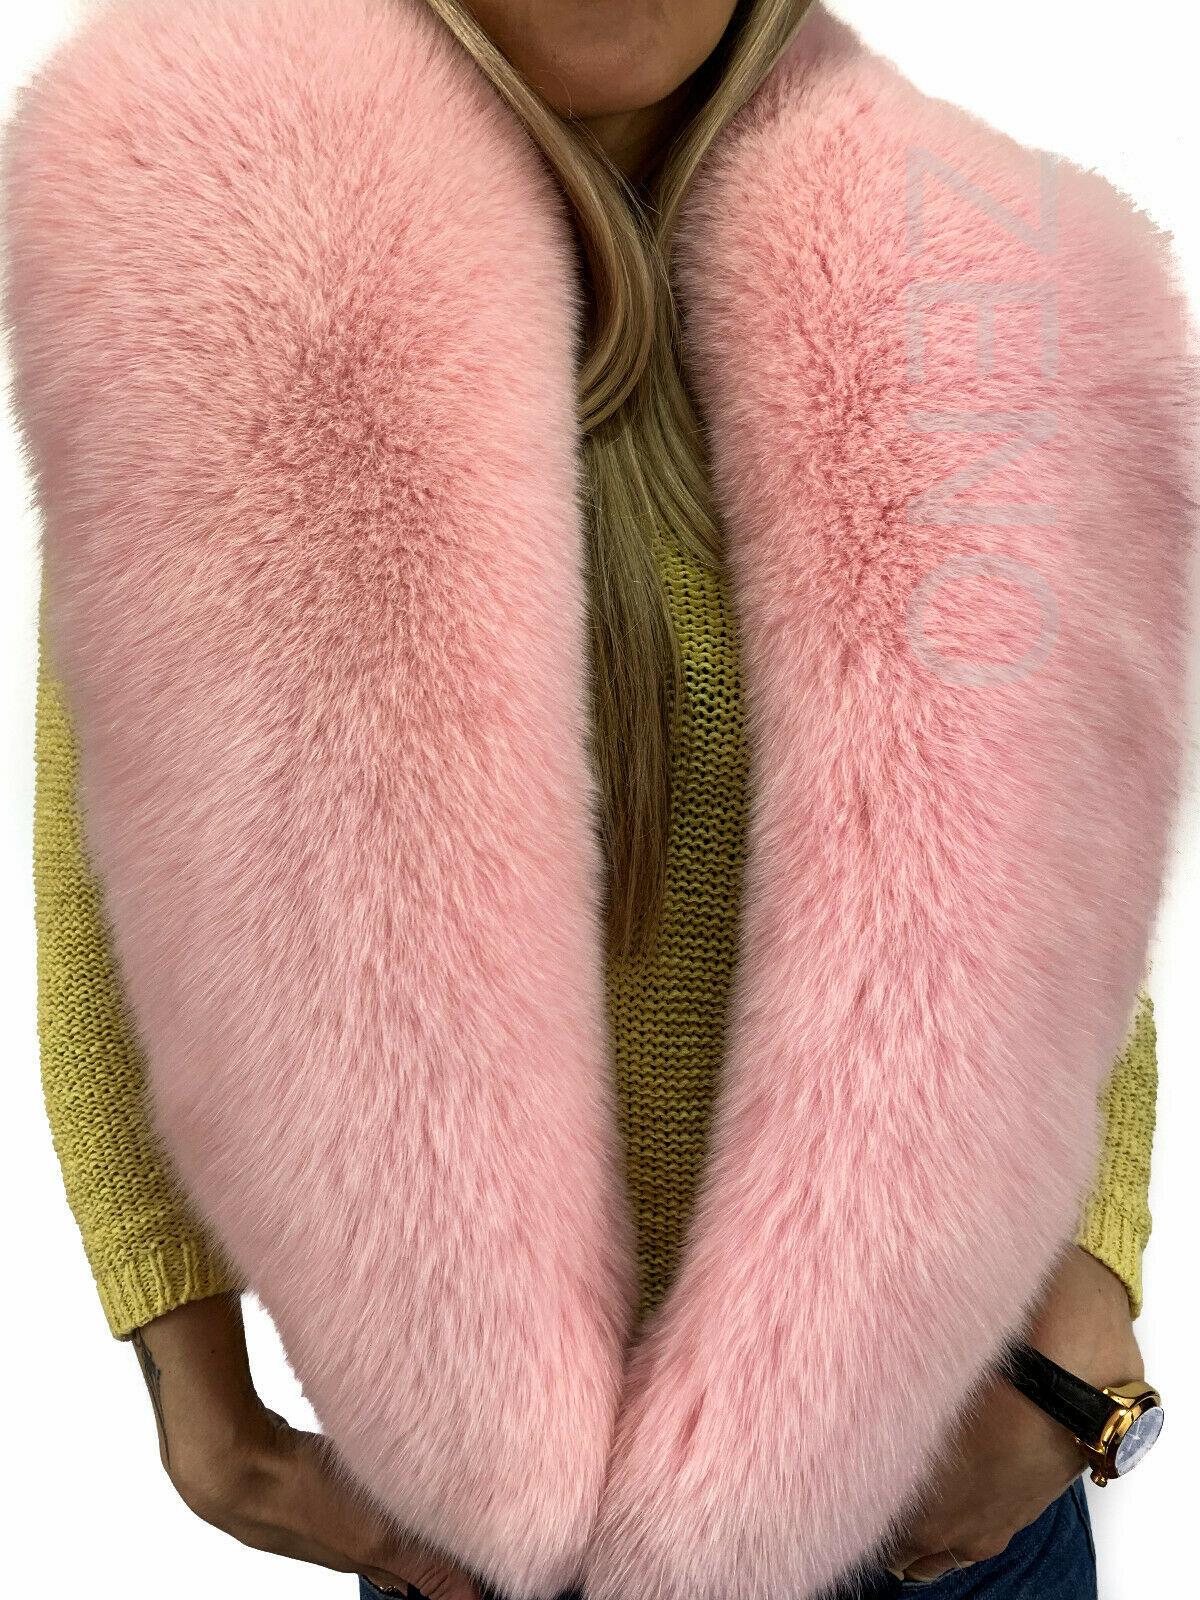 for whole family unique design another chance Arctic Fox Fur Stole 63' (160cm) Saga Furs Boa Light Pink Fur ...